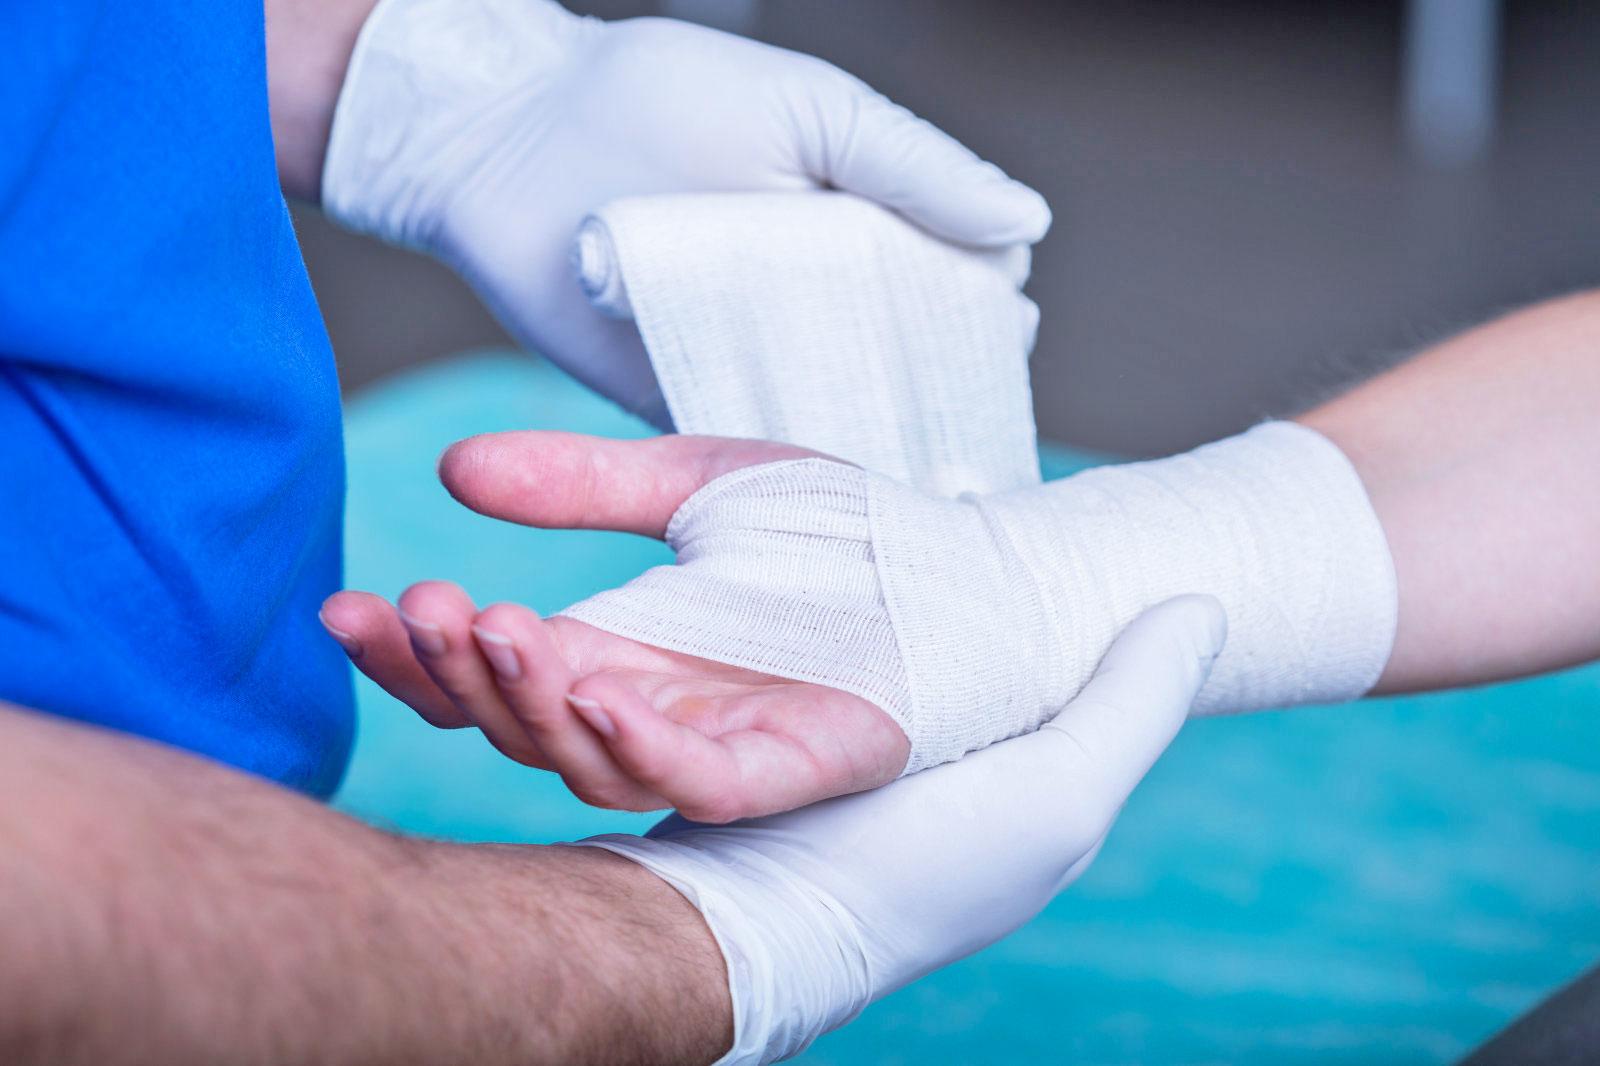 smart bandages track healing process